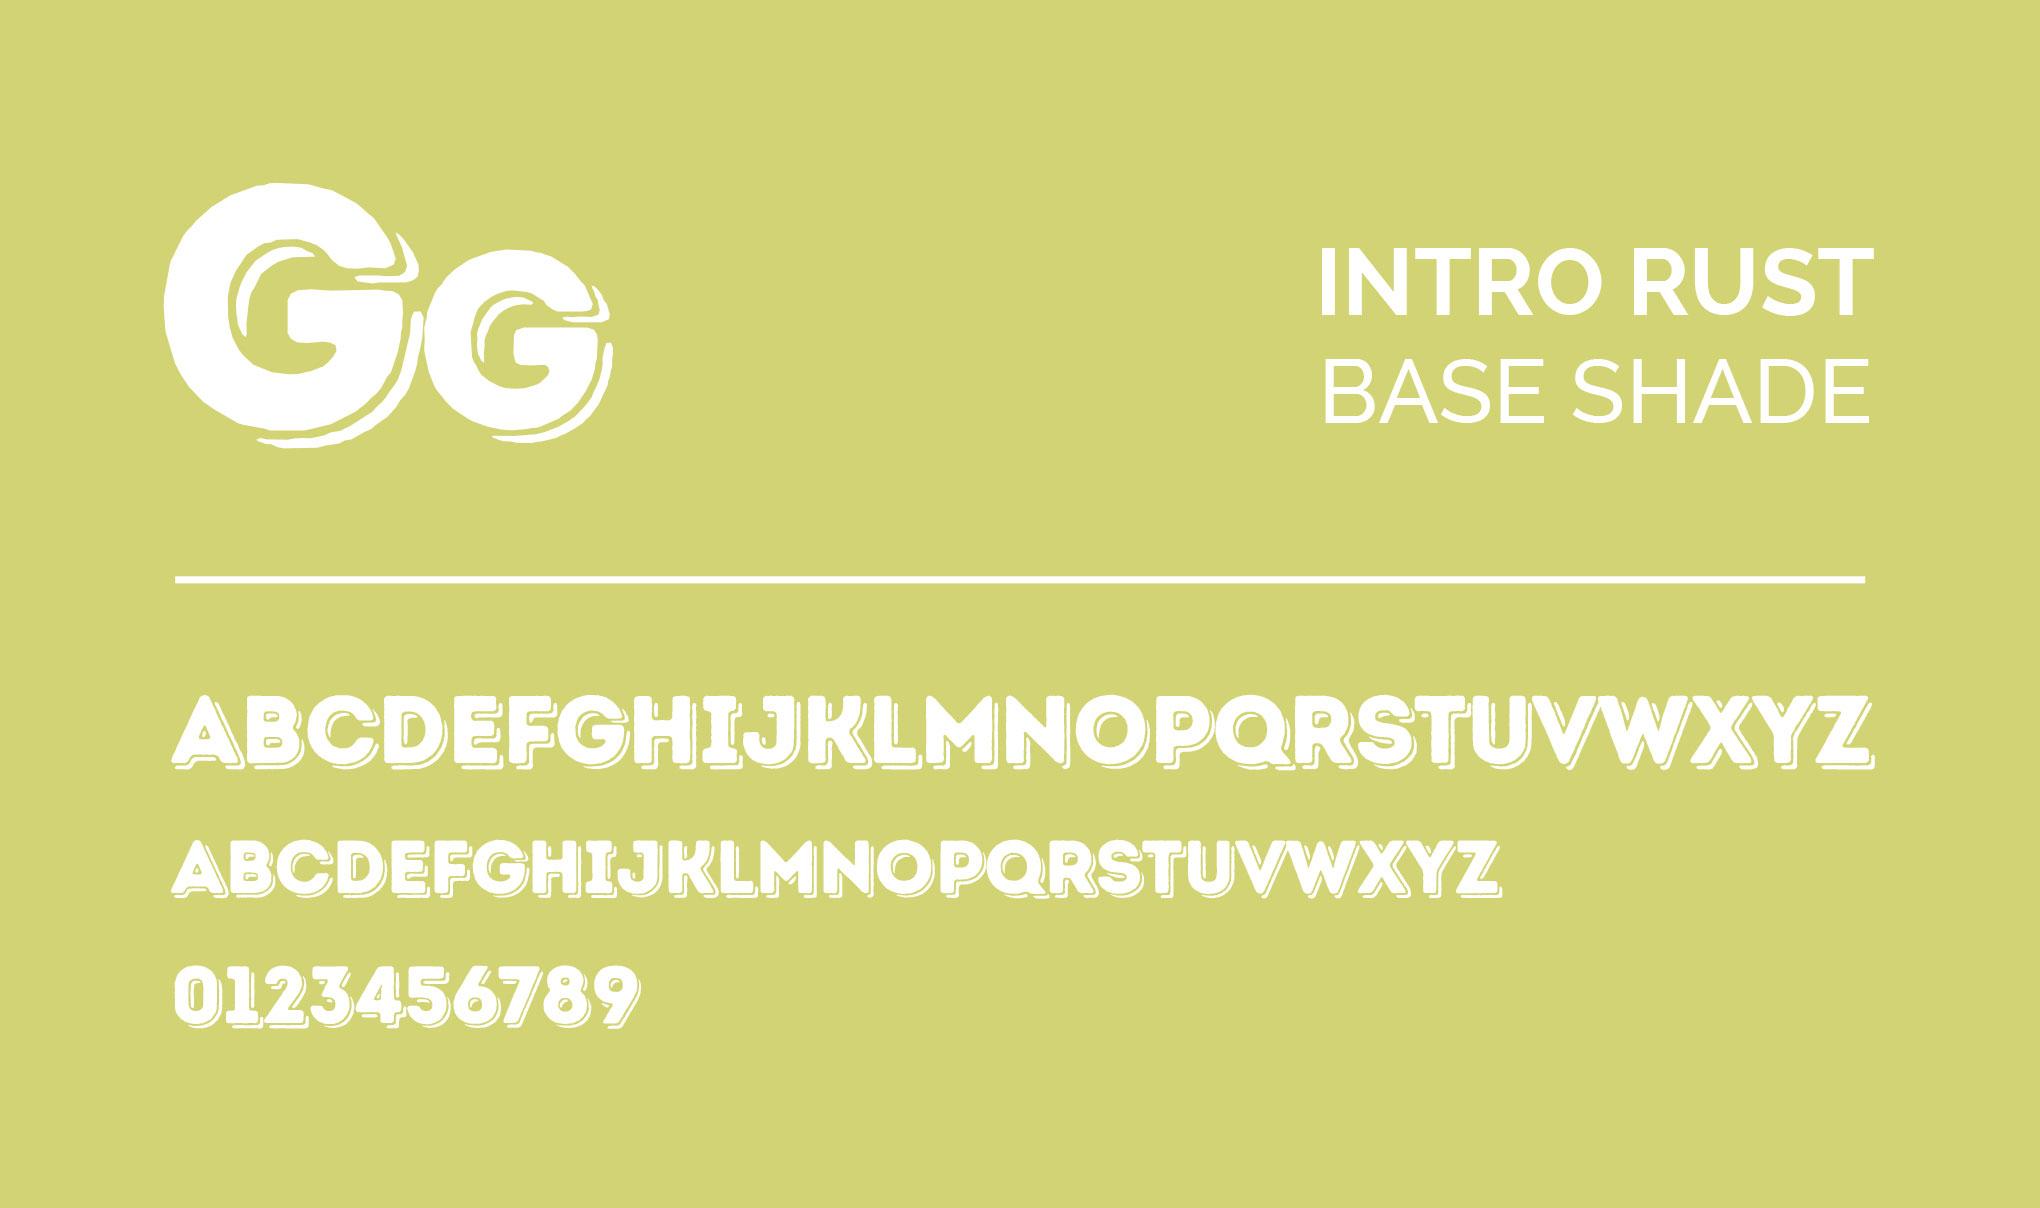 INTRO RUST - Base Shade. Font layout.